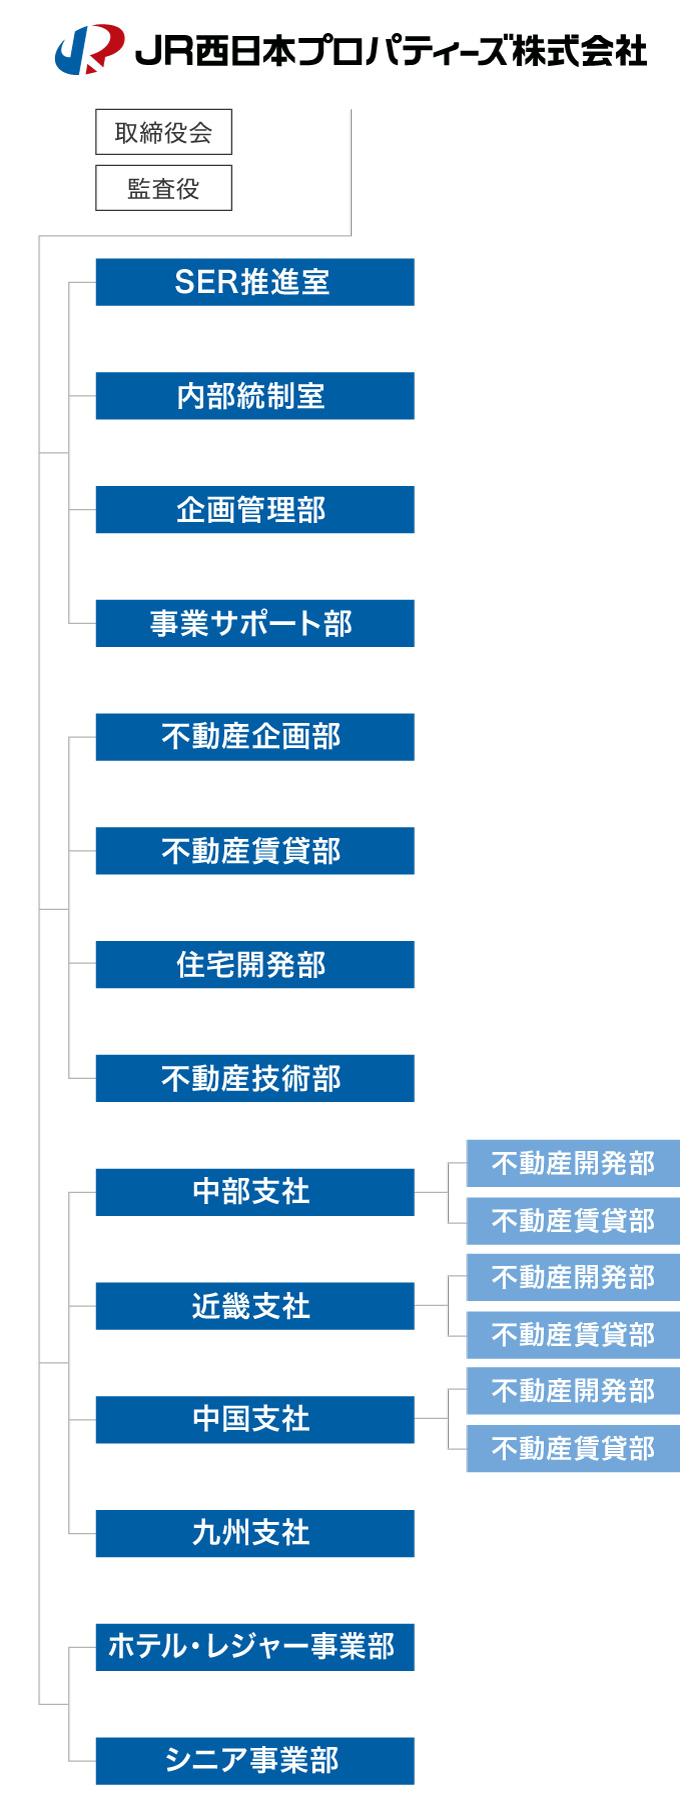 Jr西日本sc開発株式会社 組織図